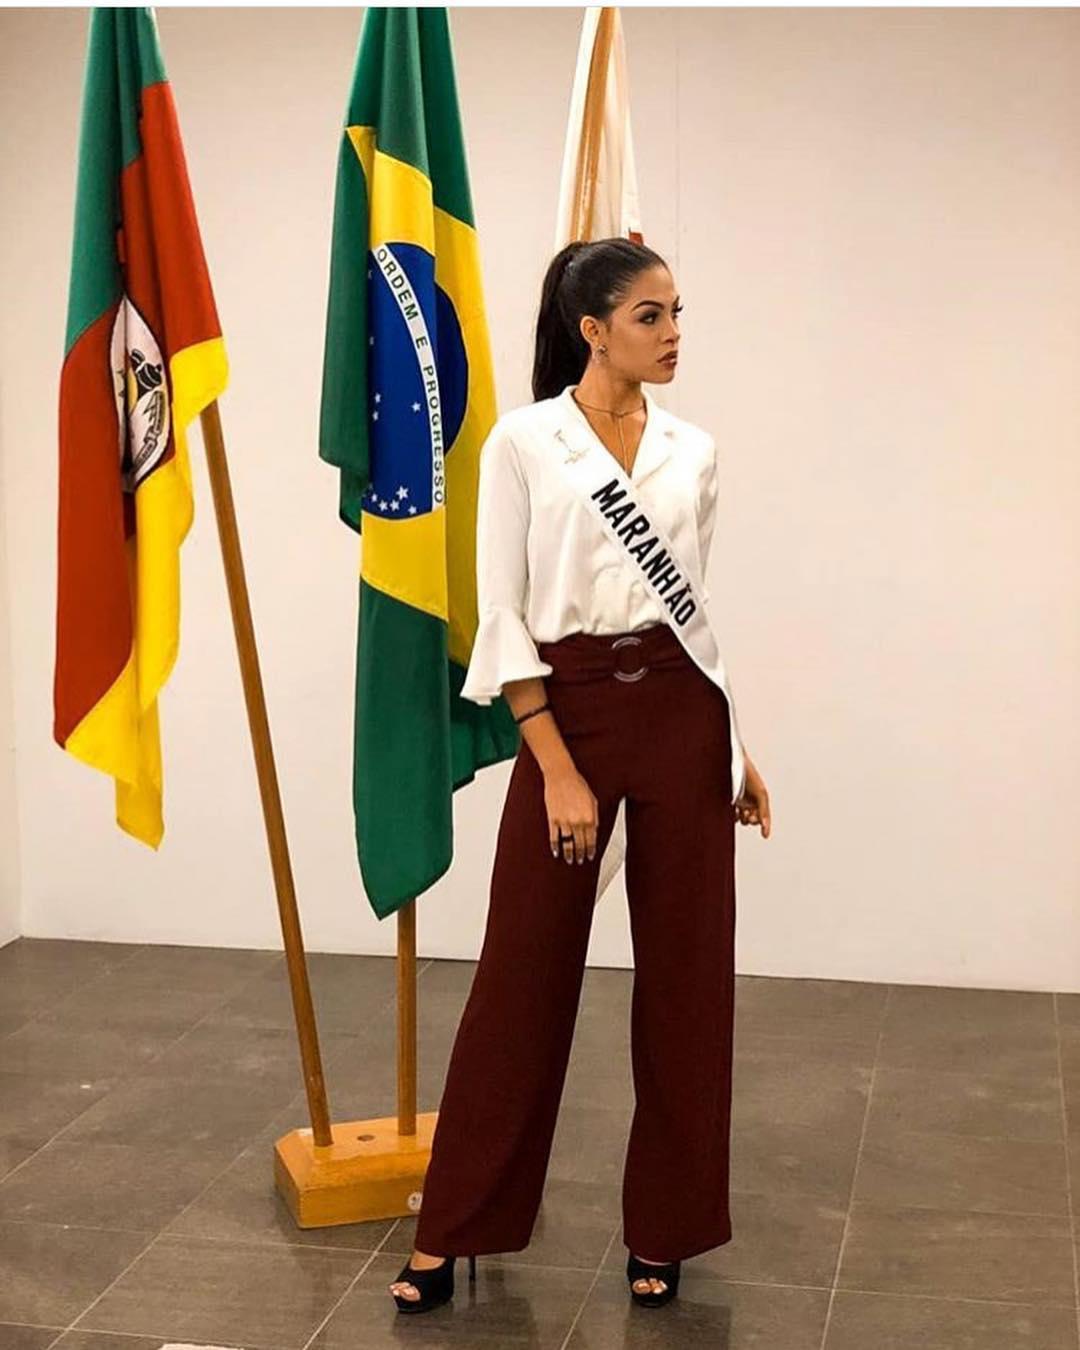 amanda brenner, miss hispanoamericana brasil 2019/top 2 de miss grand brasil 2019/top 2 de rainha da pecuaria internacional 2018. - Página 3 Alex-p49